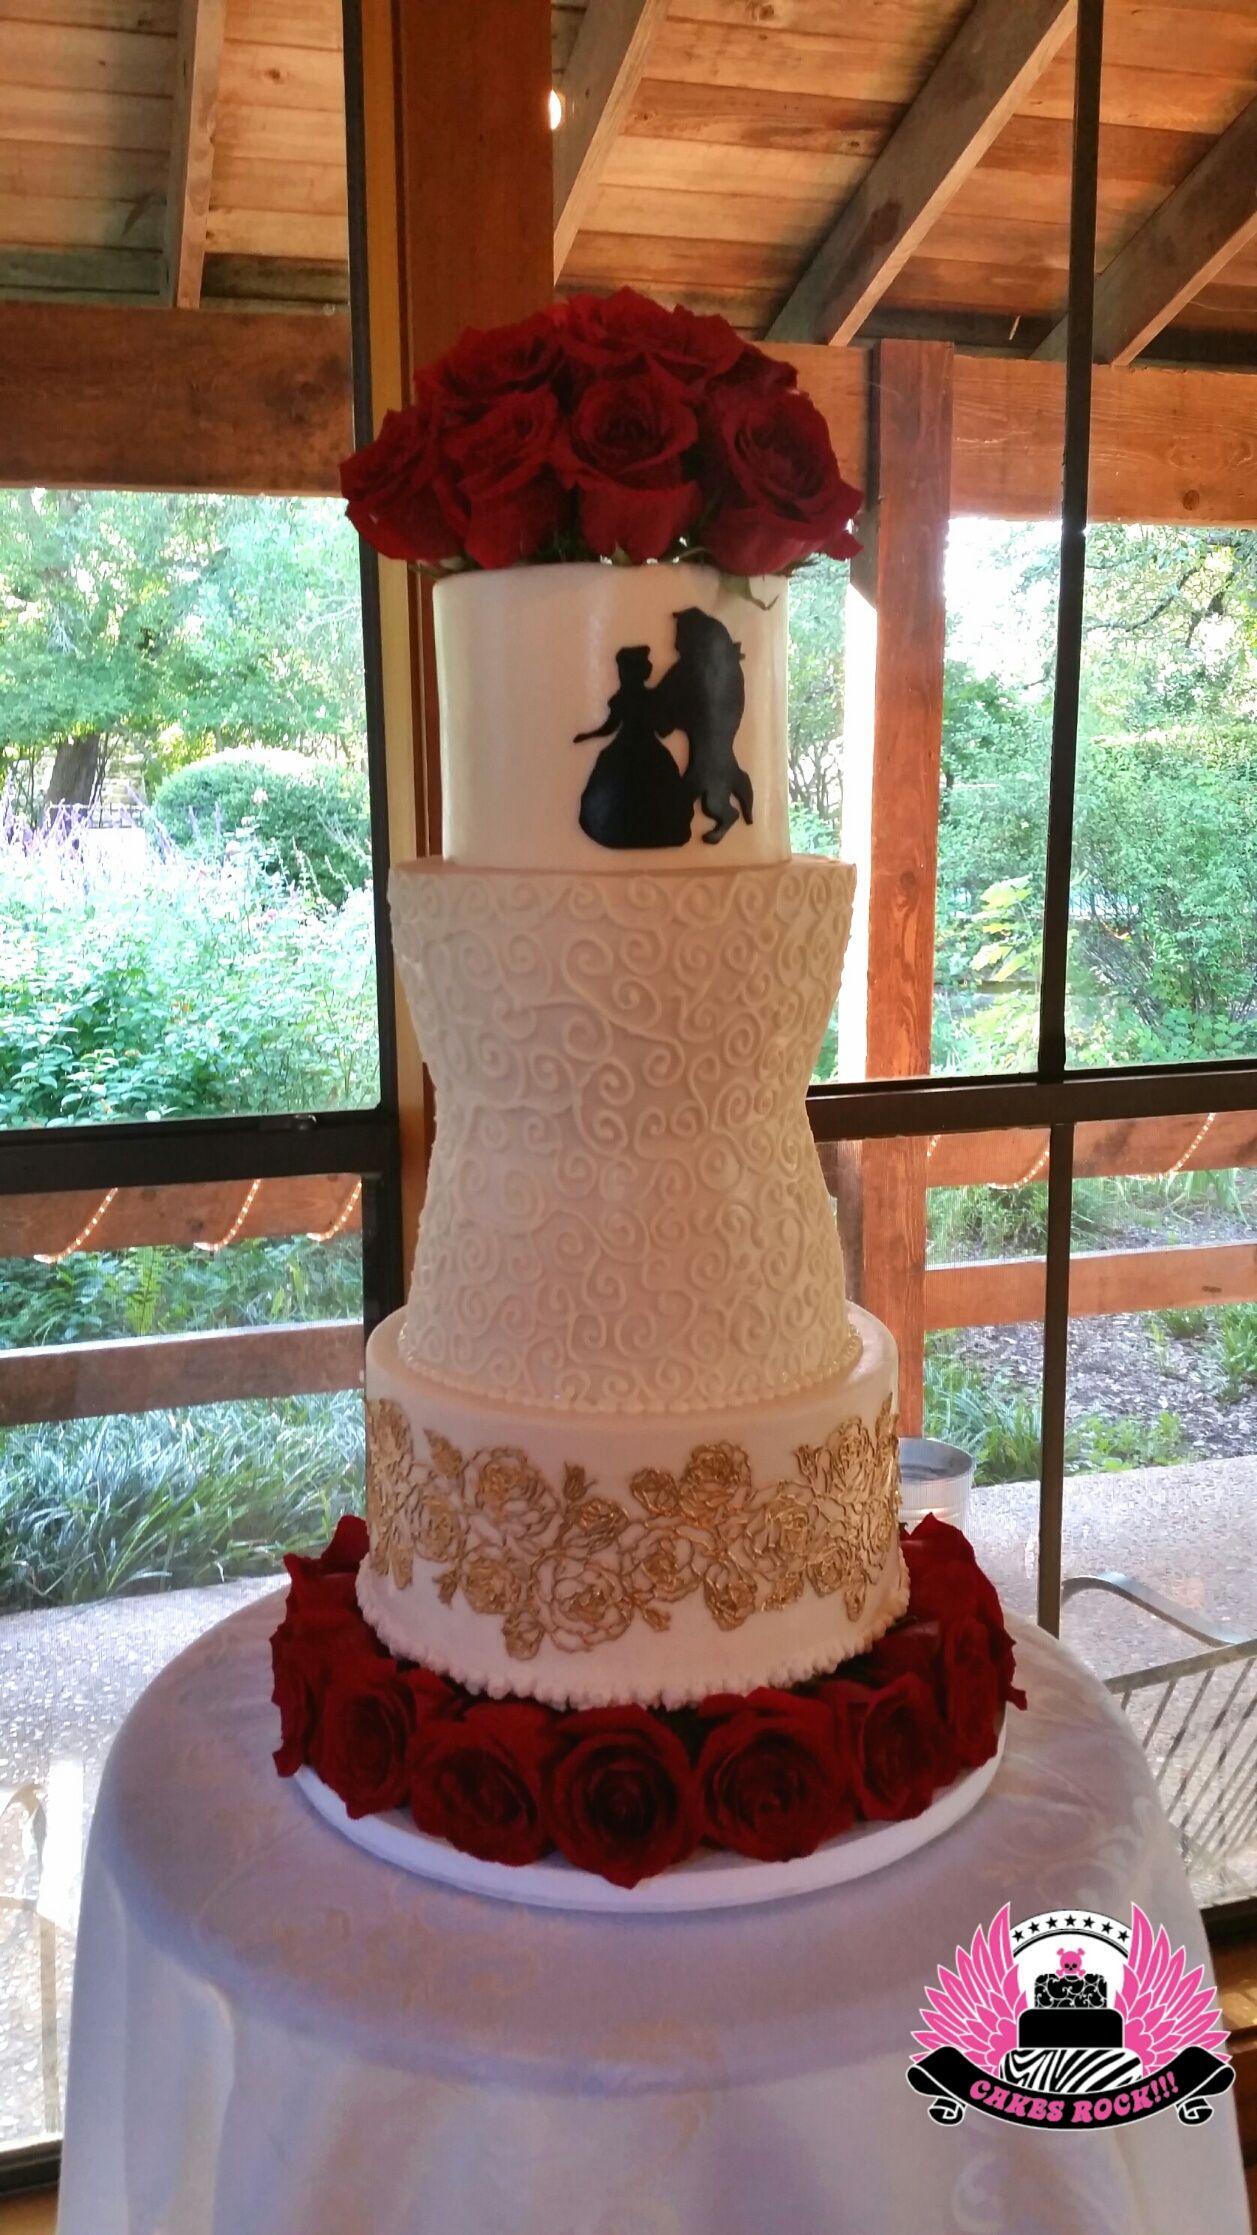 Beauty the Beast themed wedding cake Austin TX Cakes ROCK